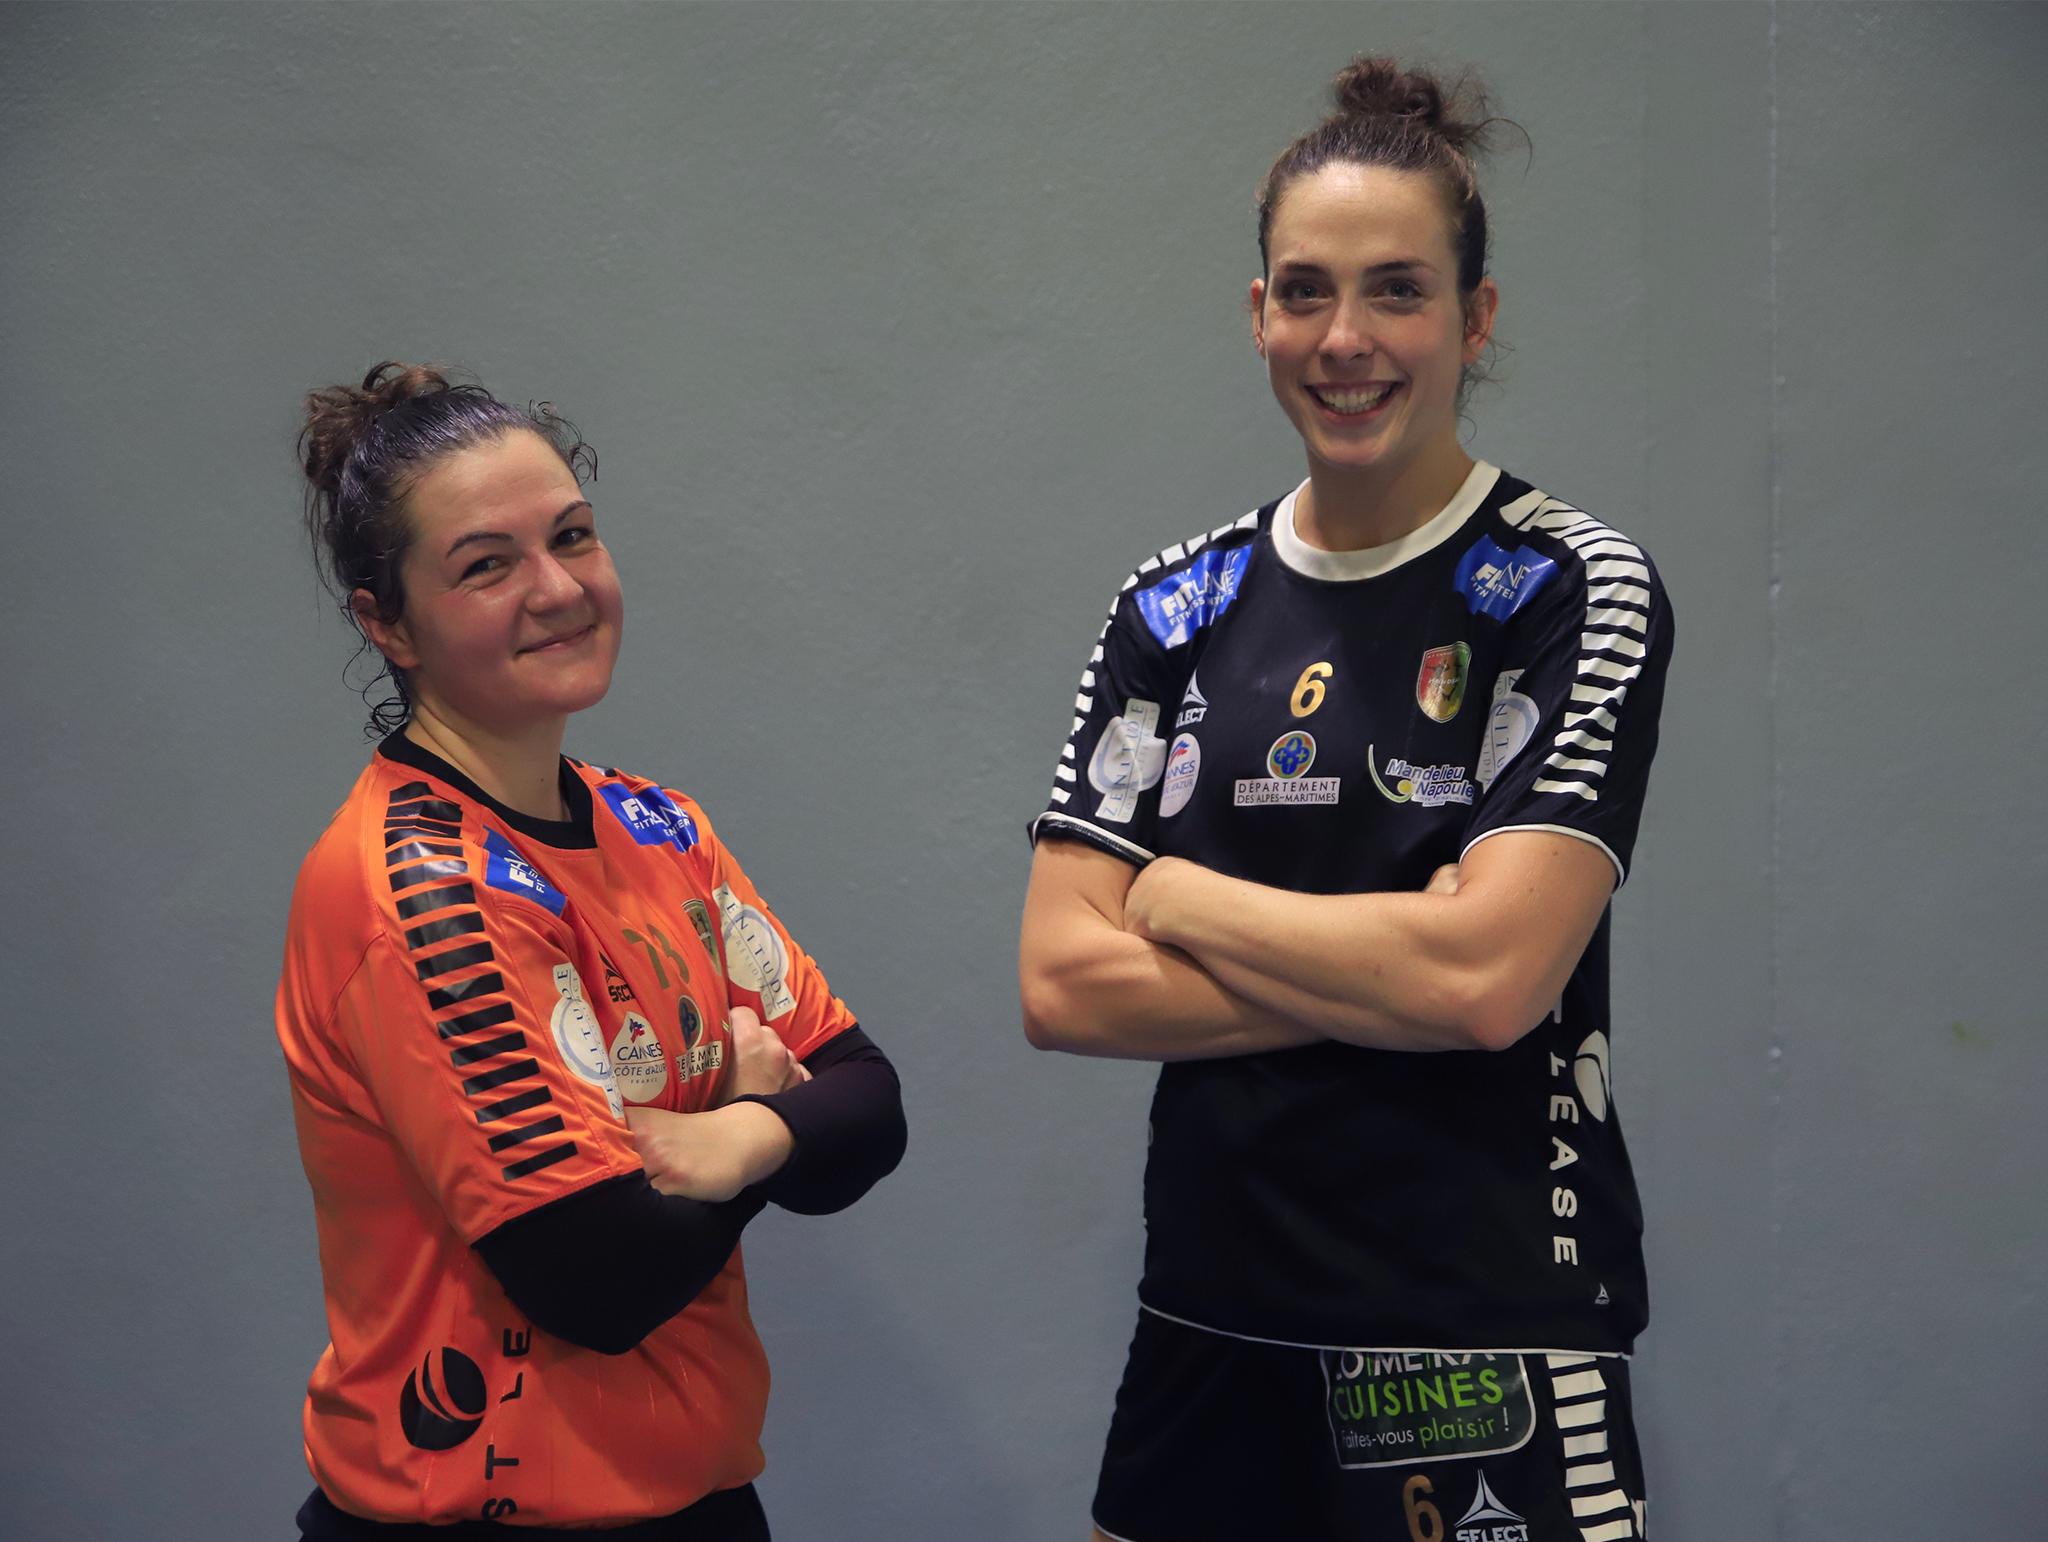 INTERVIEW Aline Scolastica & Anna Manaut